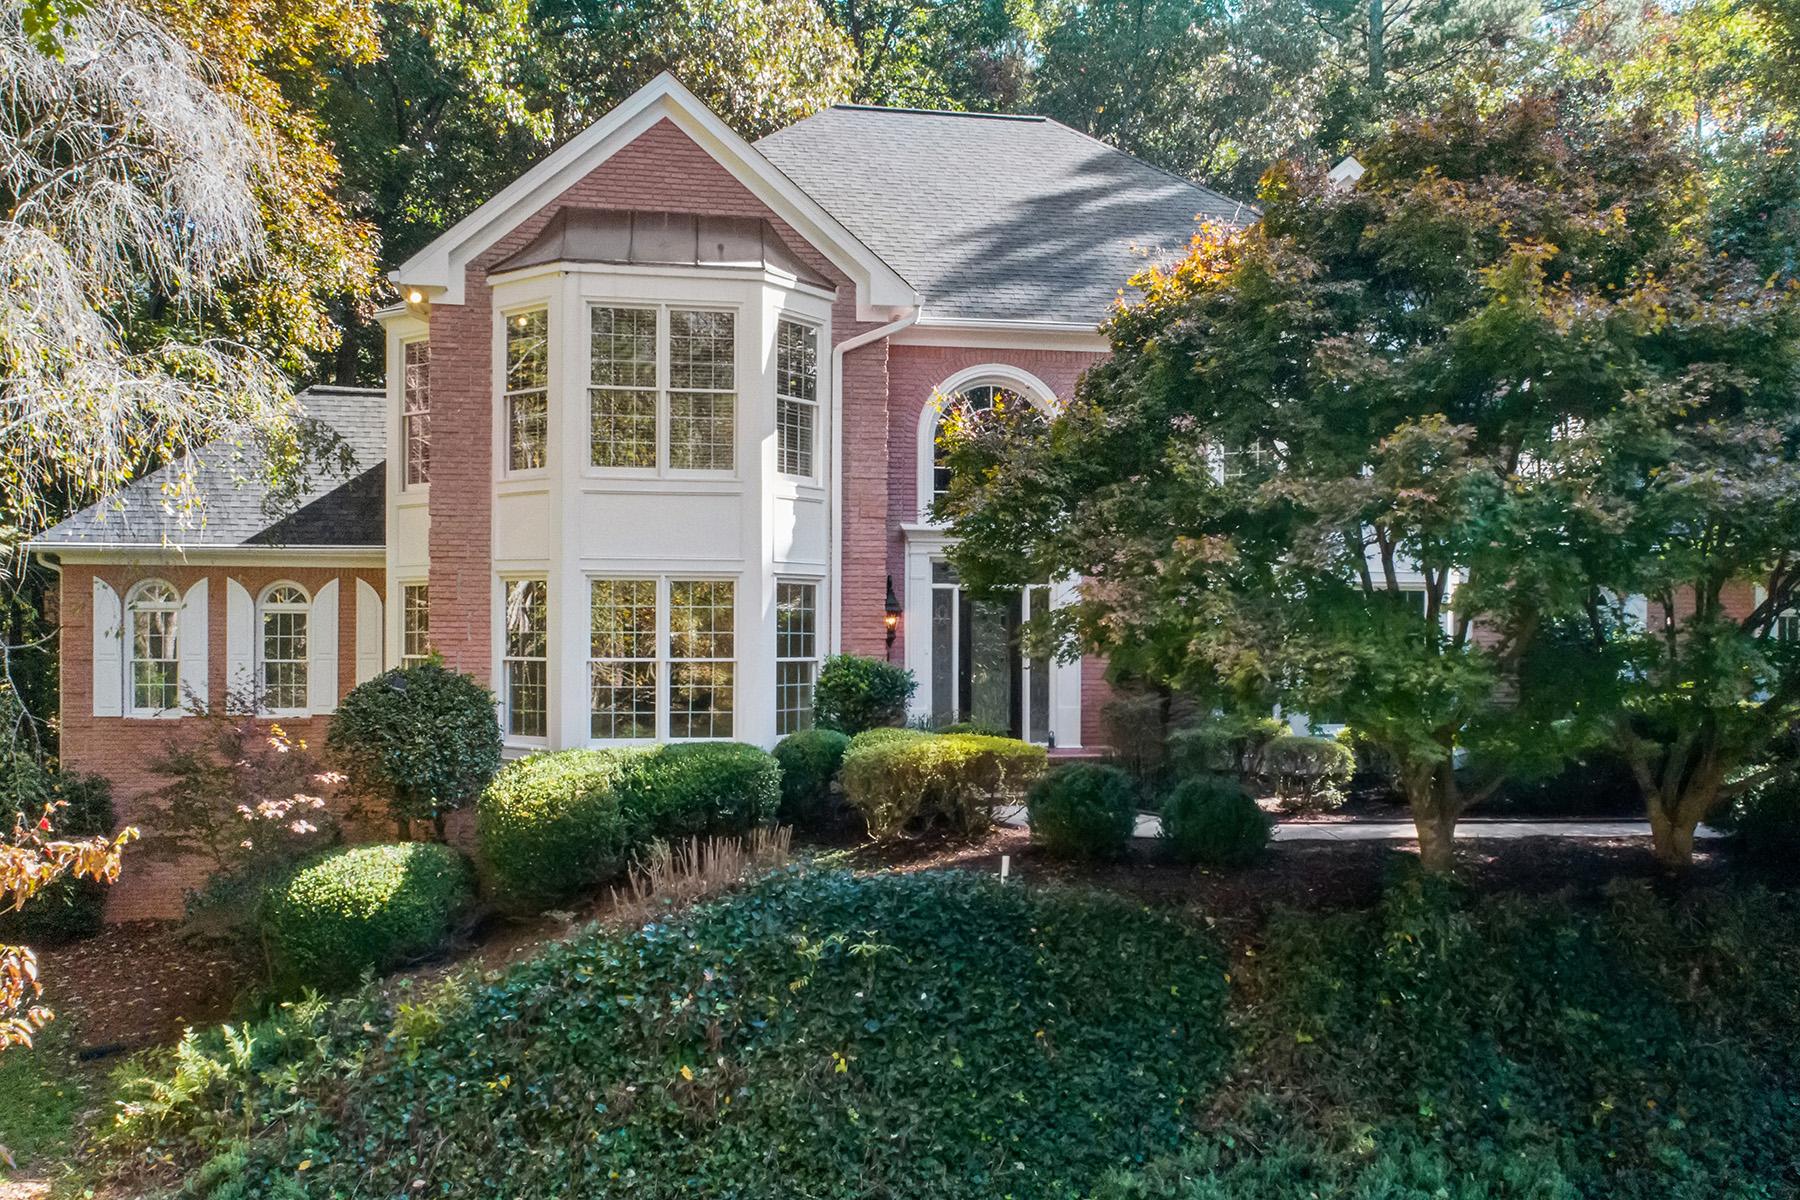 Property для того Продажа на Traditional Rivergate Home With Elegant Detail 7555 Bridgegate Court, Sandy Springs, Джорджия 30350 Соединенные Штаты